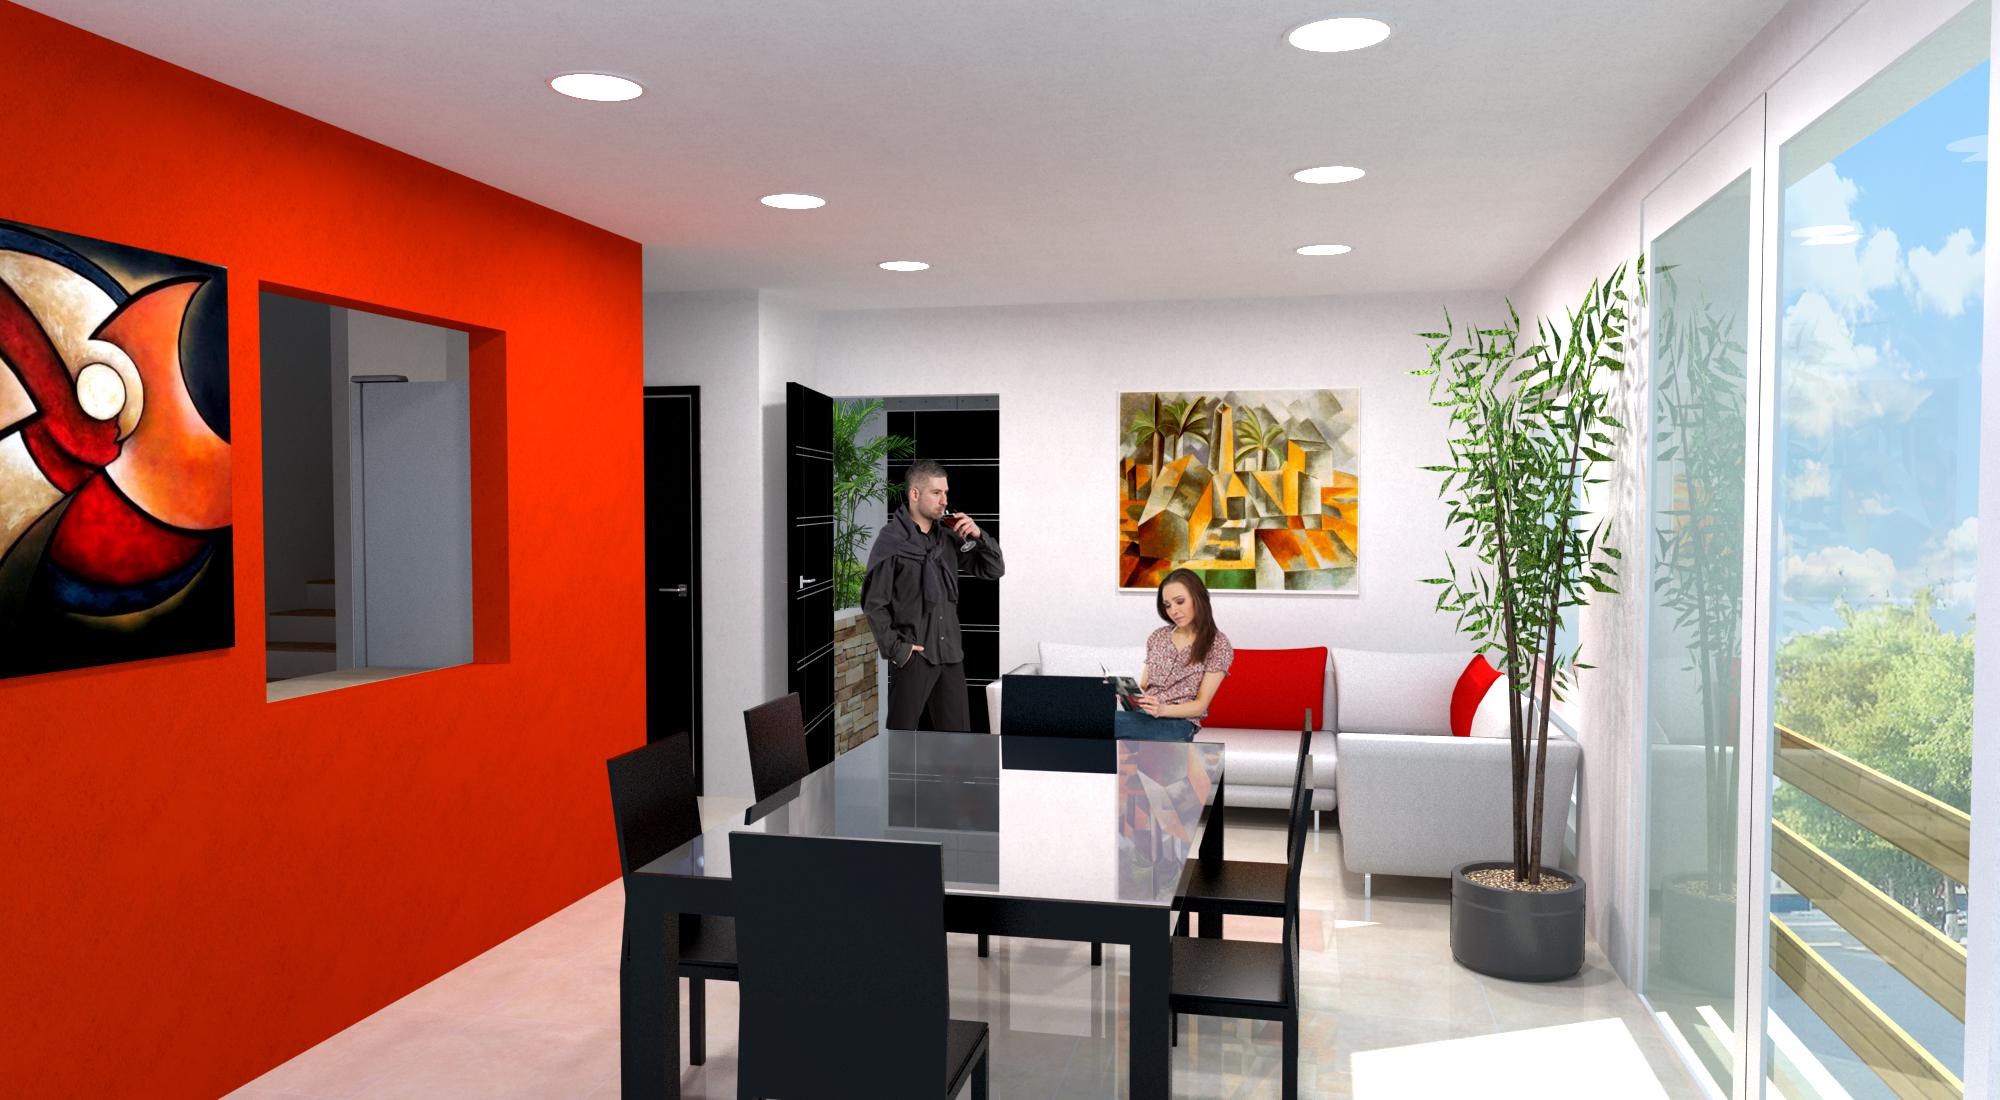 Morne calvaire apartments by alan gonzalez at for Departamento de interior